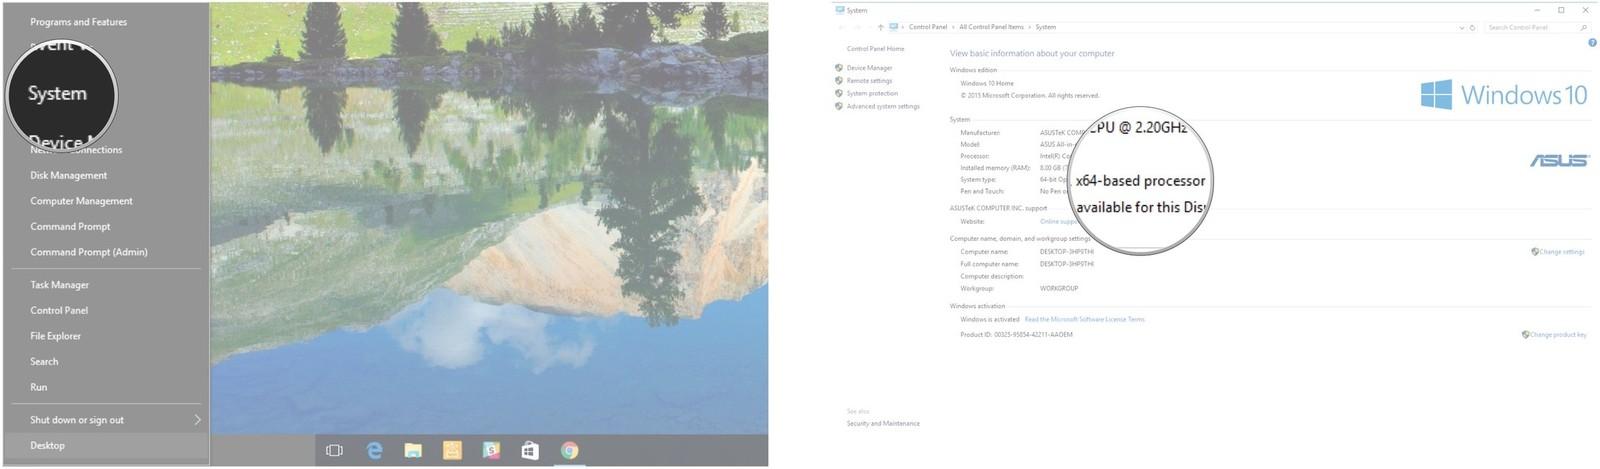 C:\Users\PC\Desktop\check-os-bit-windows-screen-01.jpeg